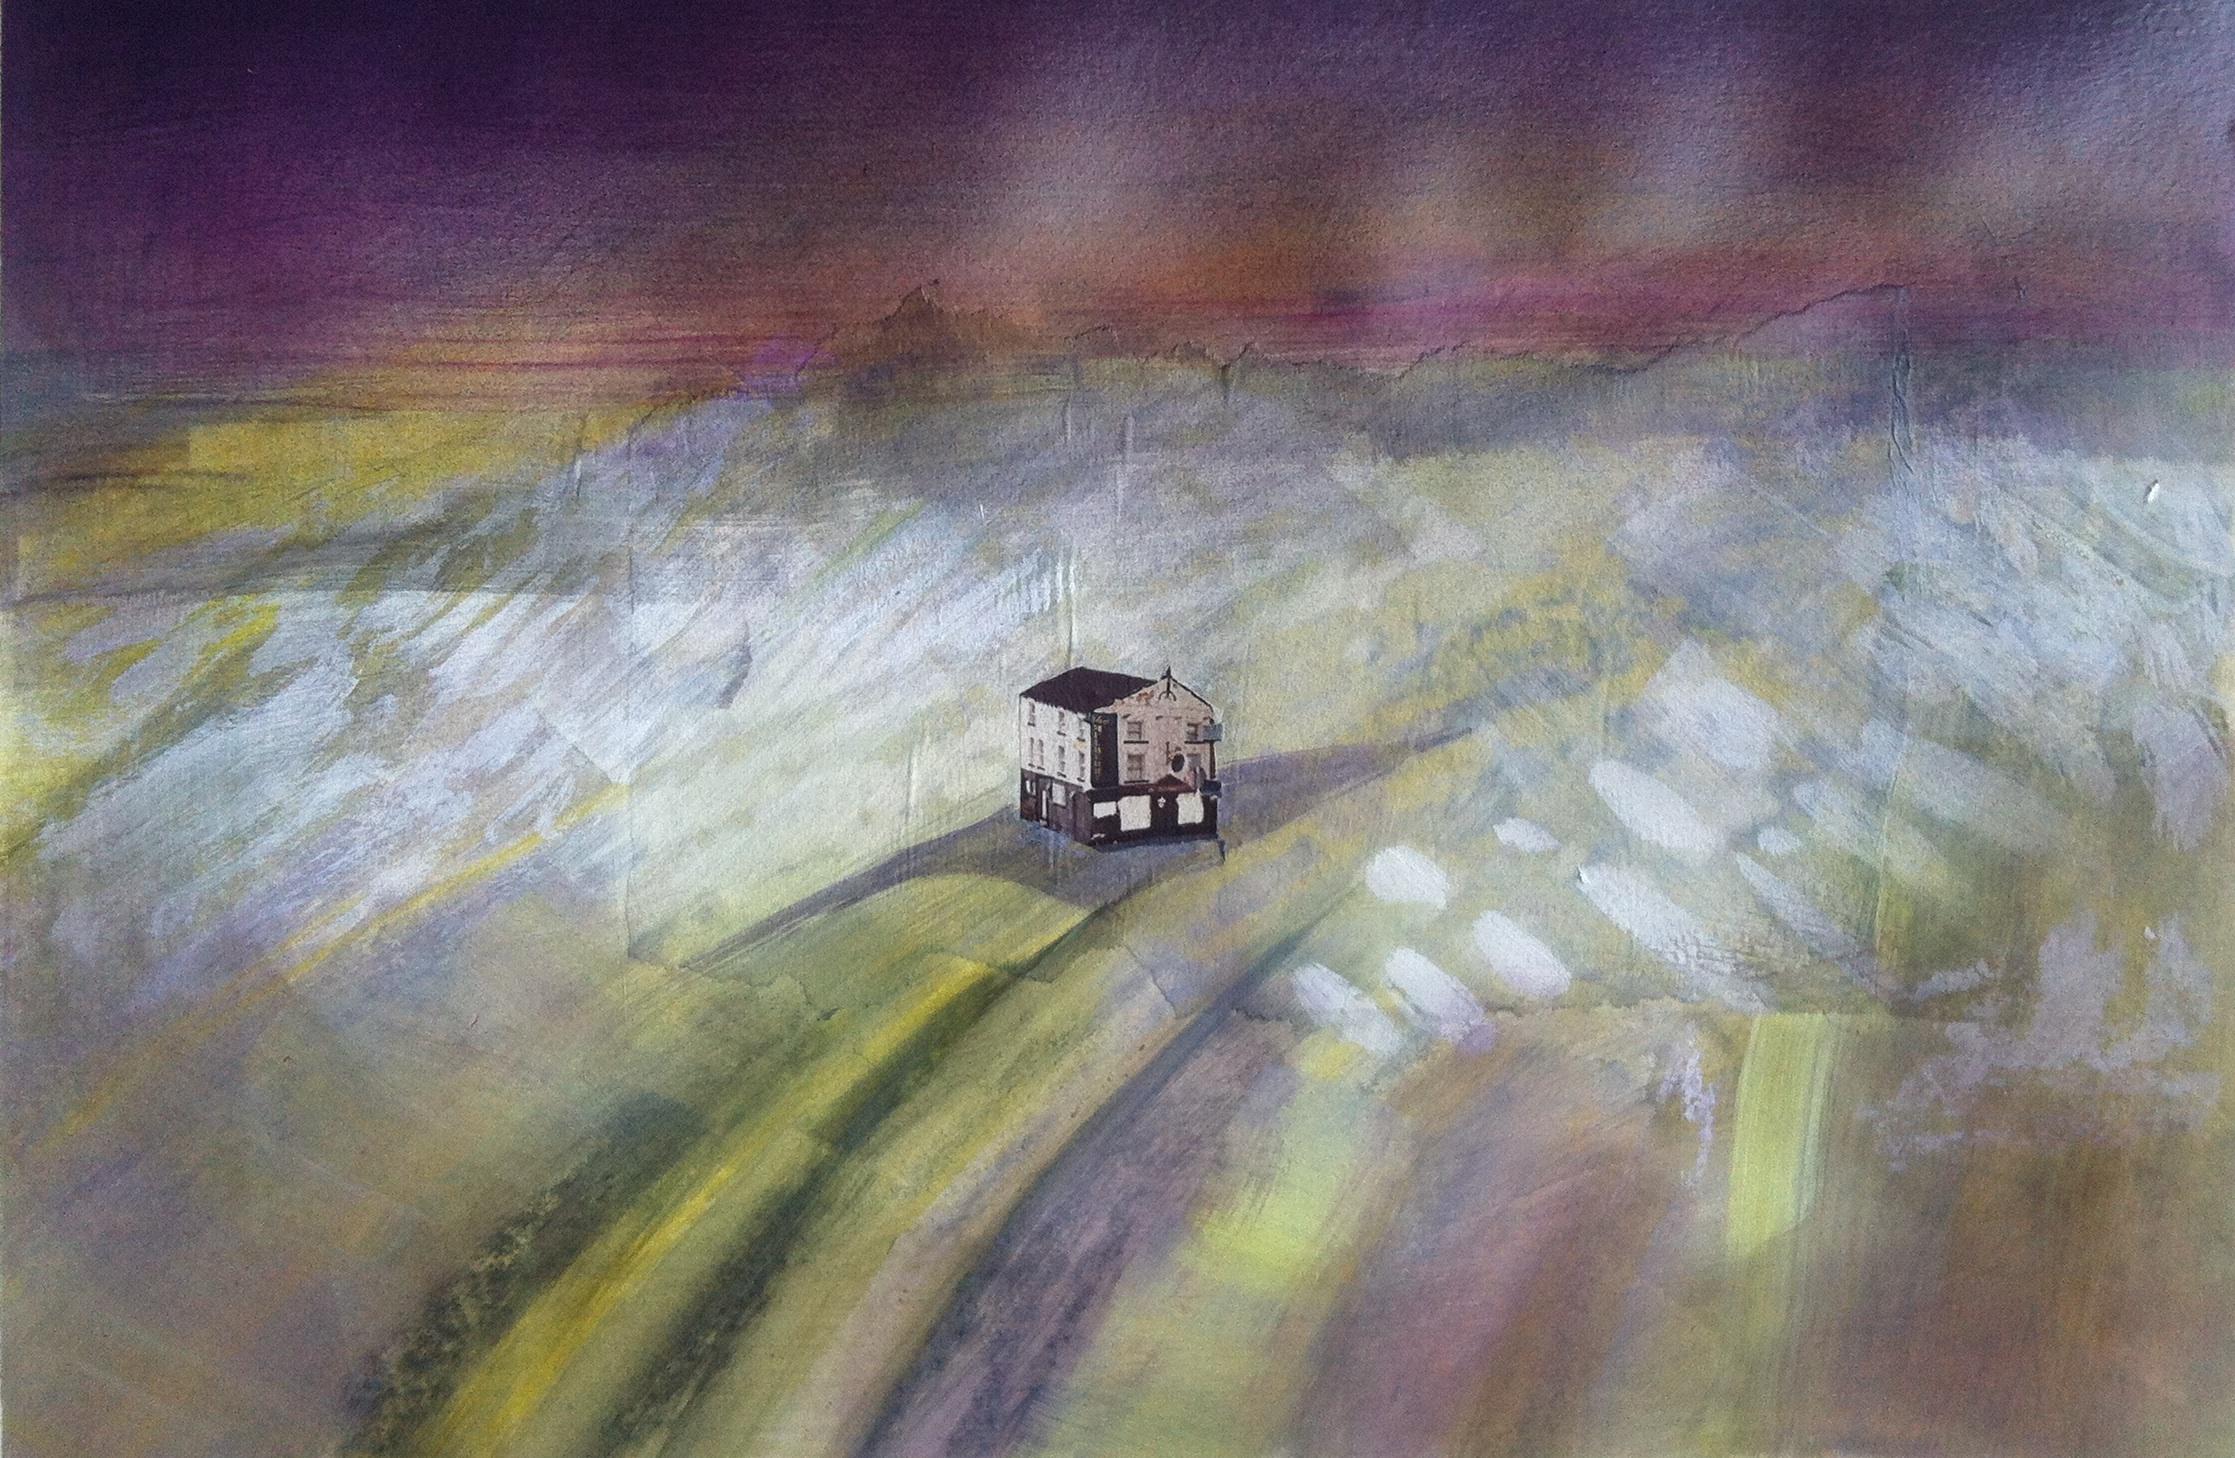 Gillian Holding Edgelands (Mulberry) (2013) mixed media on paper 35cm x 45cm£400